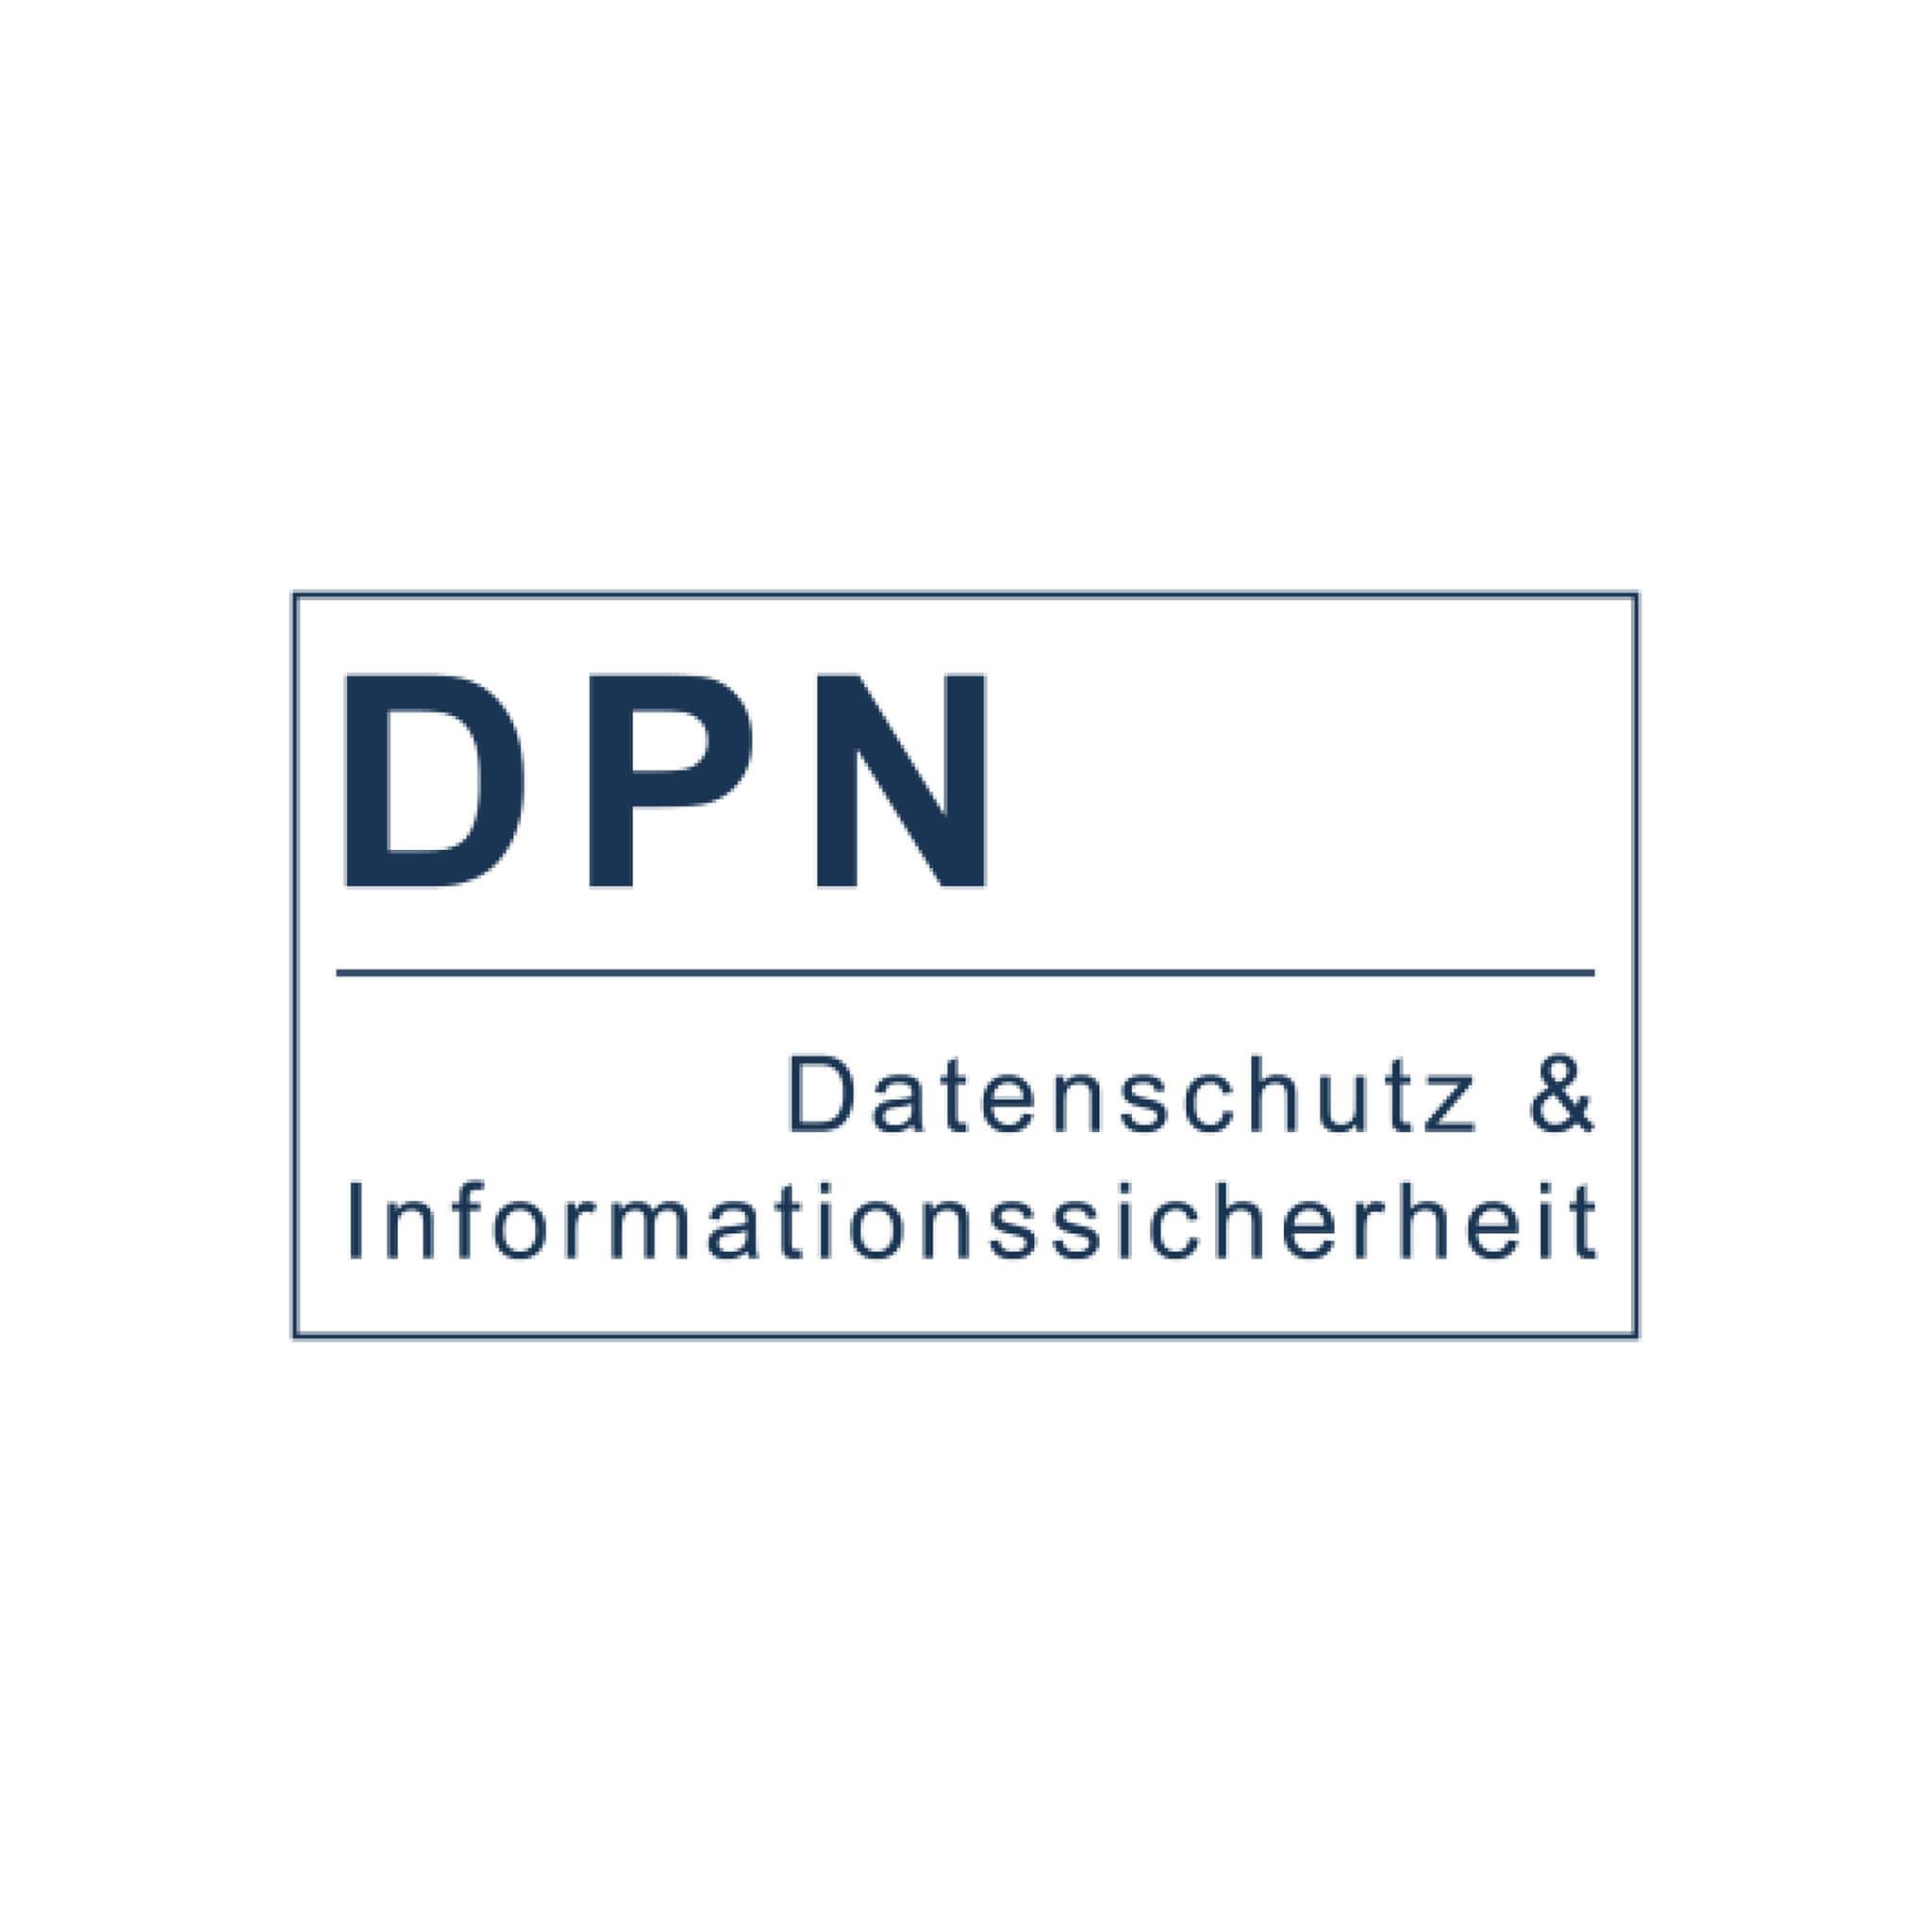 Logo der DPN Datenschutz GbR